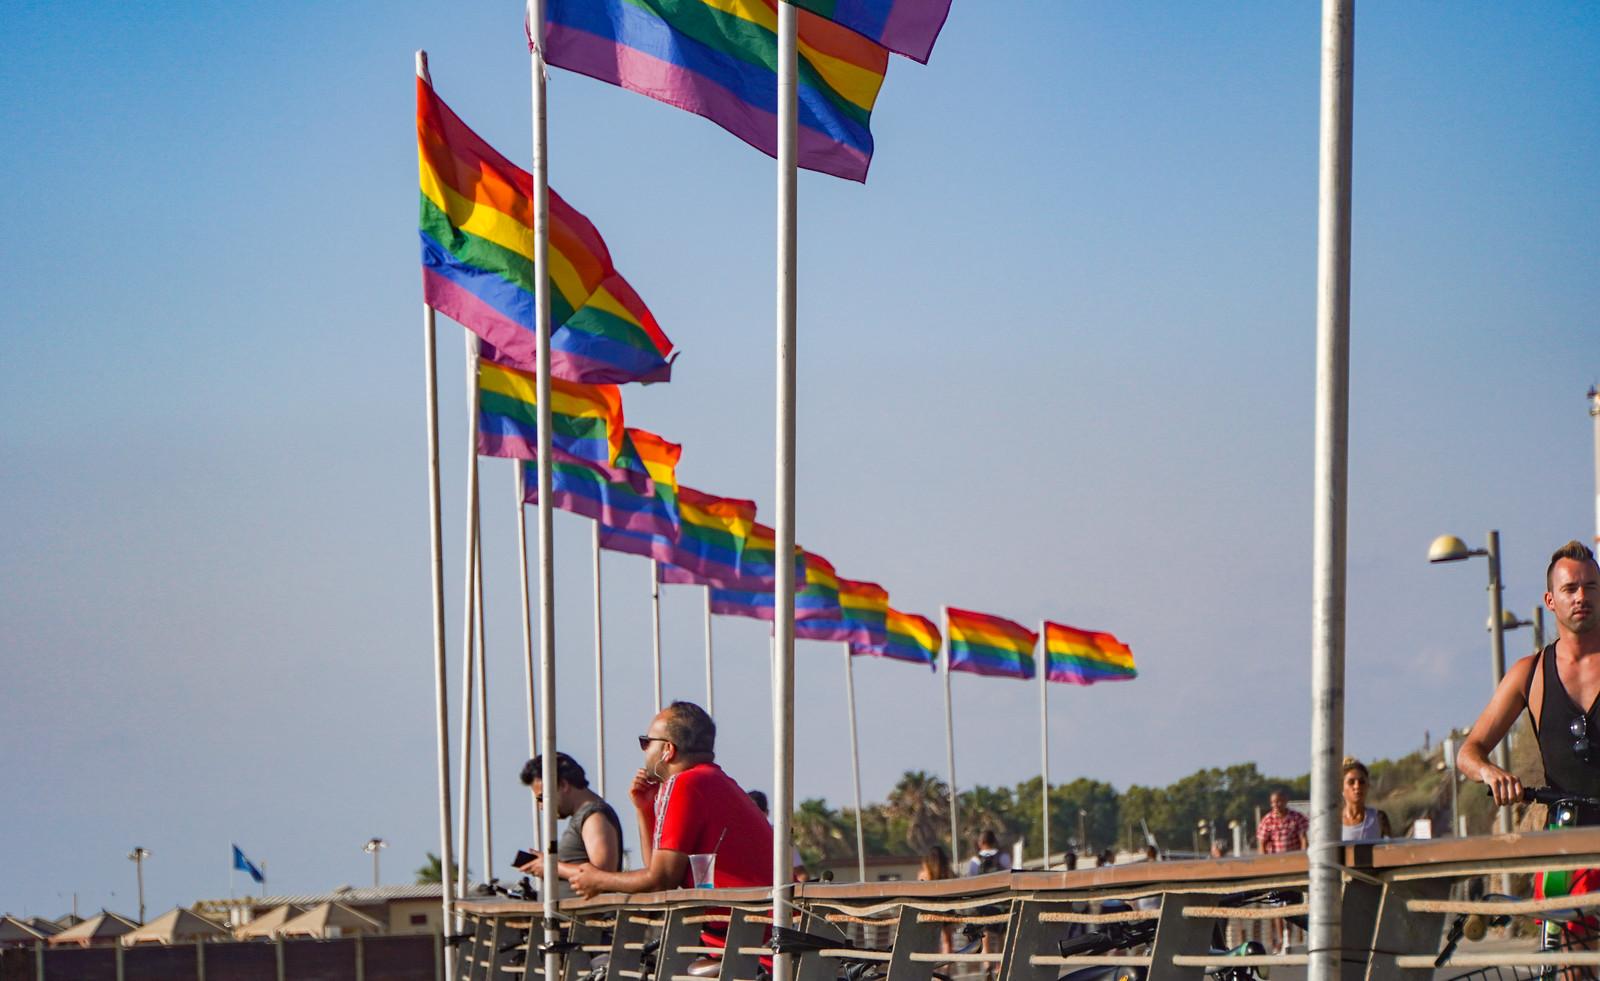 2019.06.13 Hilton Beach at Tel Aviv Pride, Tel Aviv Israel 1640024